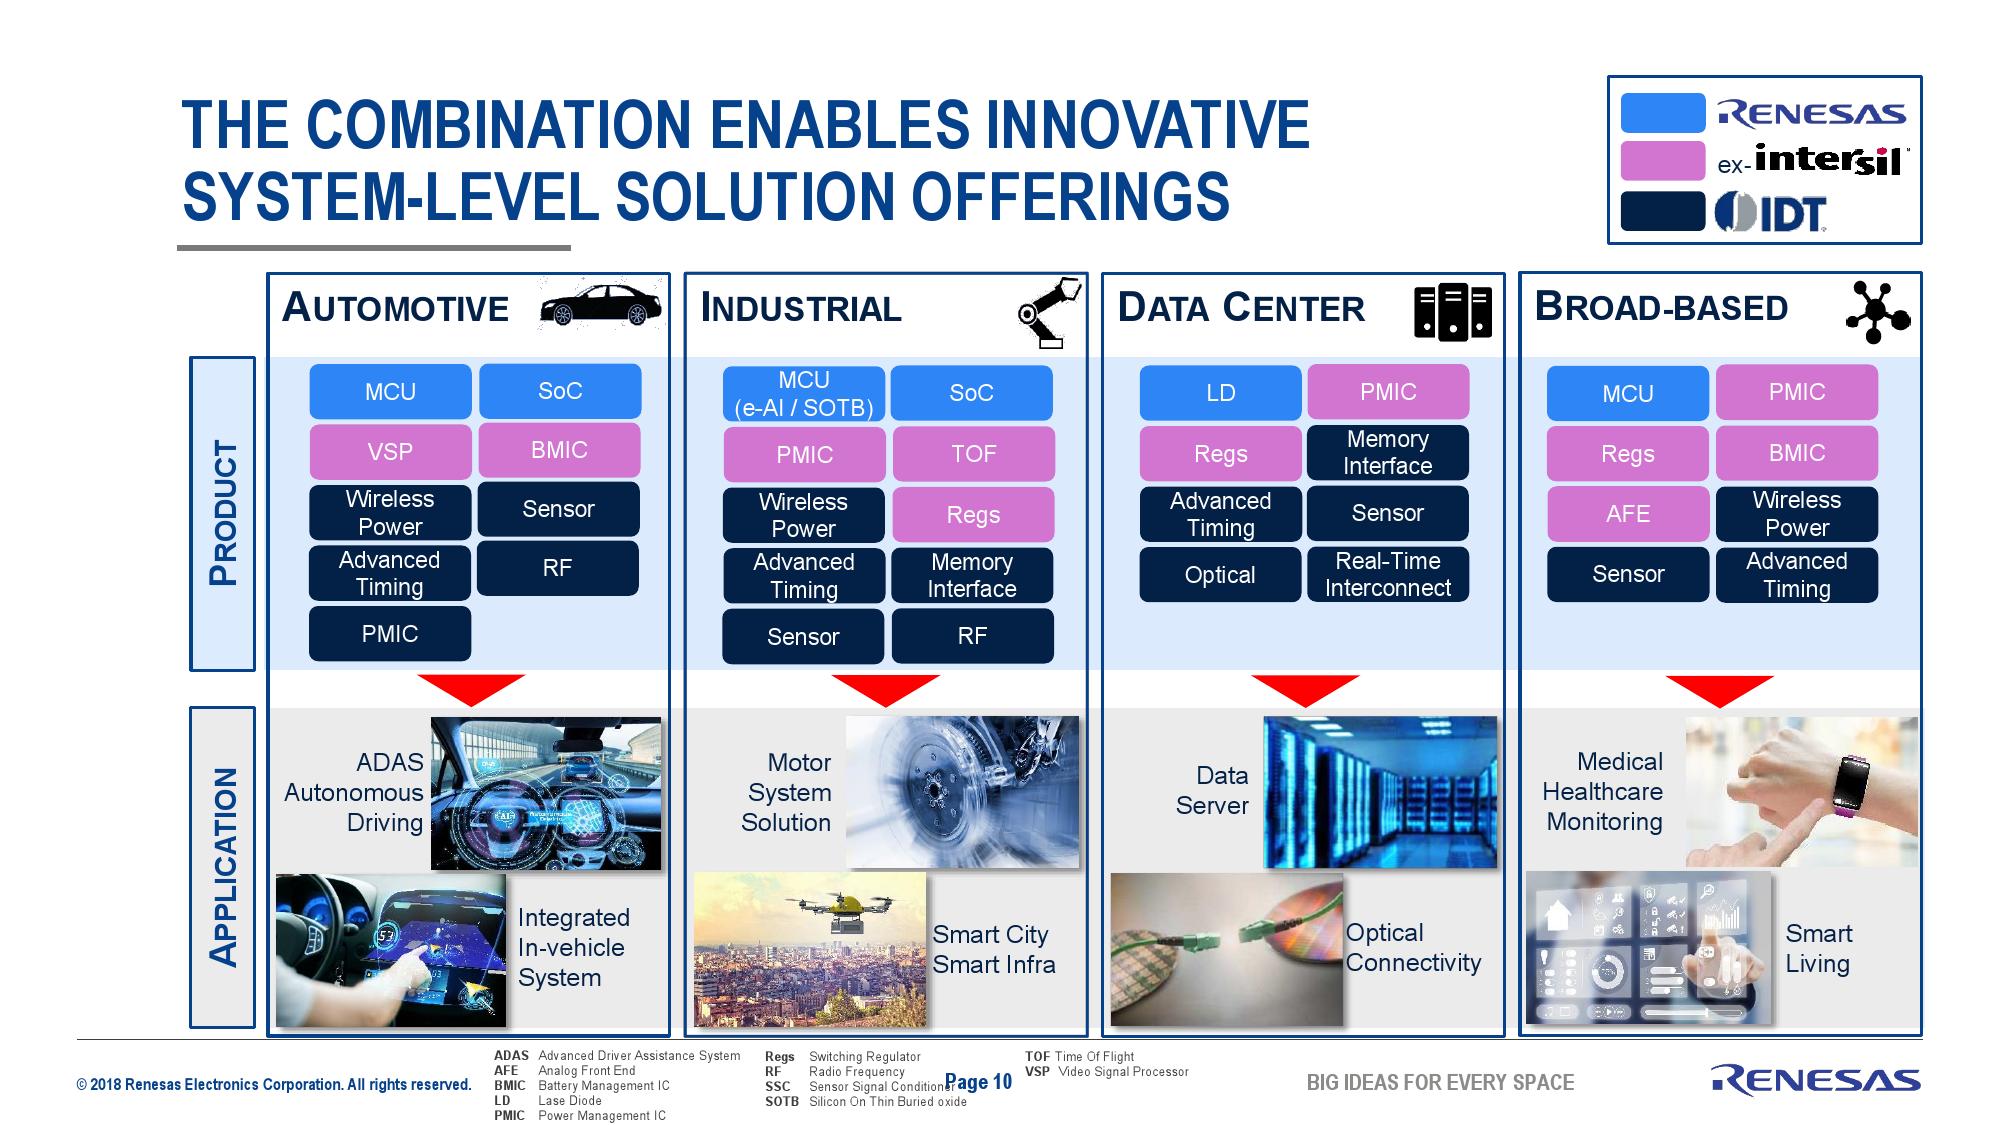 Renesas to Buy IDT, Expand Product Portfolio